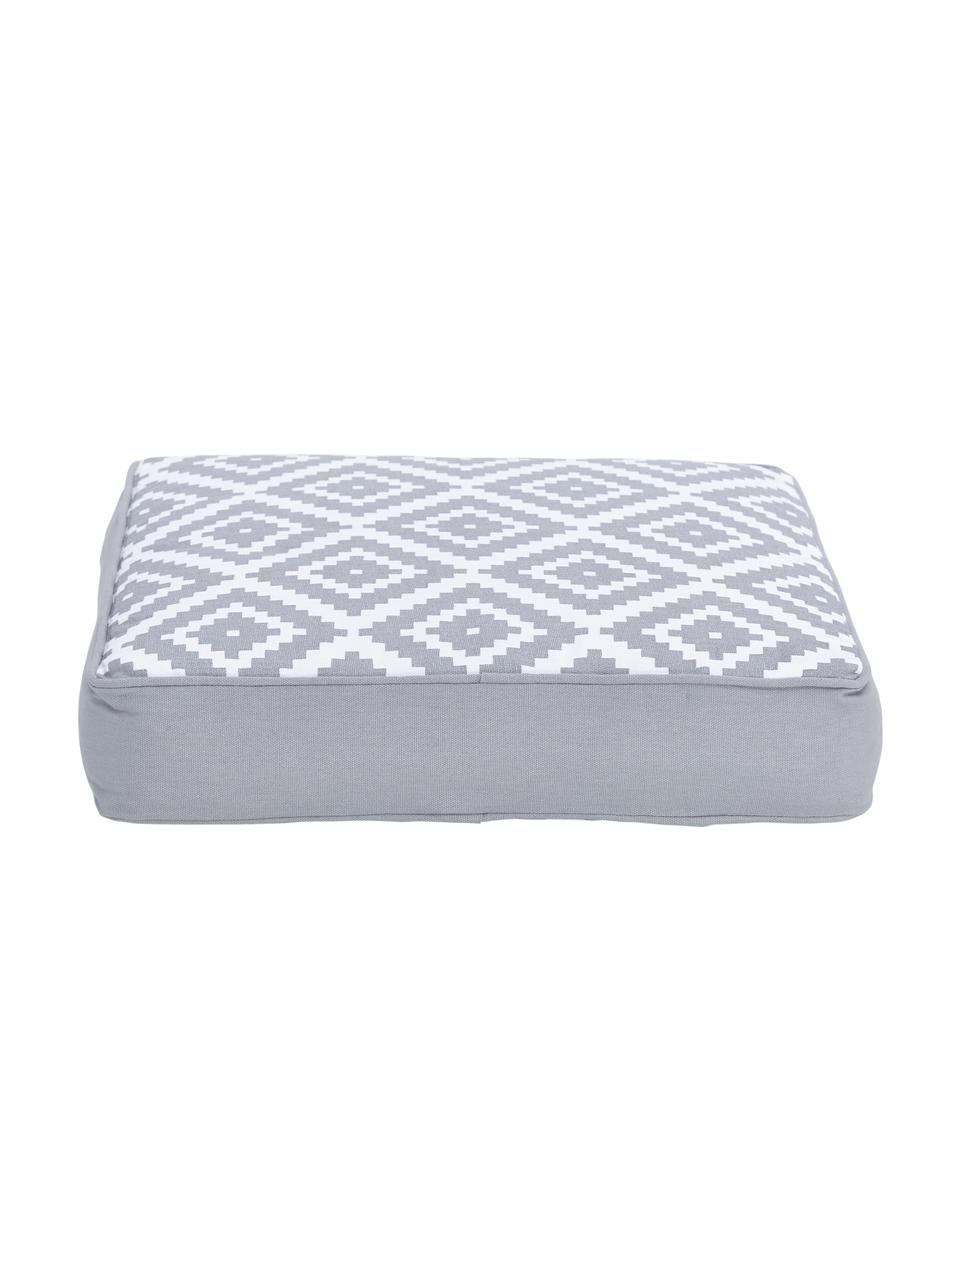 Hohes Sitzkissen Miami in Hellgrau/Weiß, Bezug: 100% Baumwolle, Grau, 40 x 40 cm